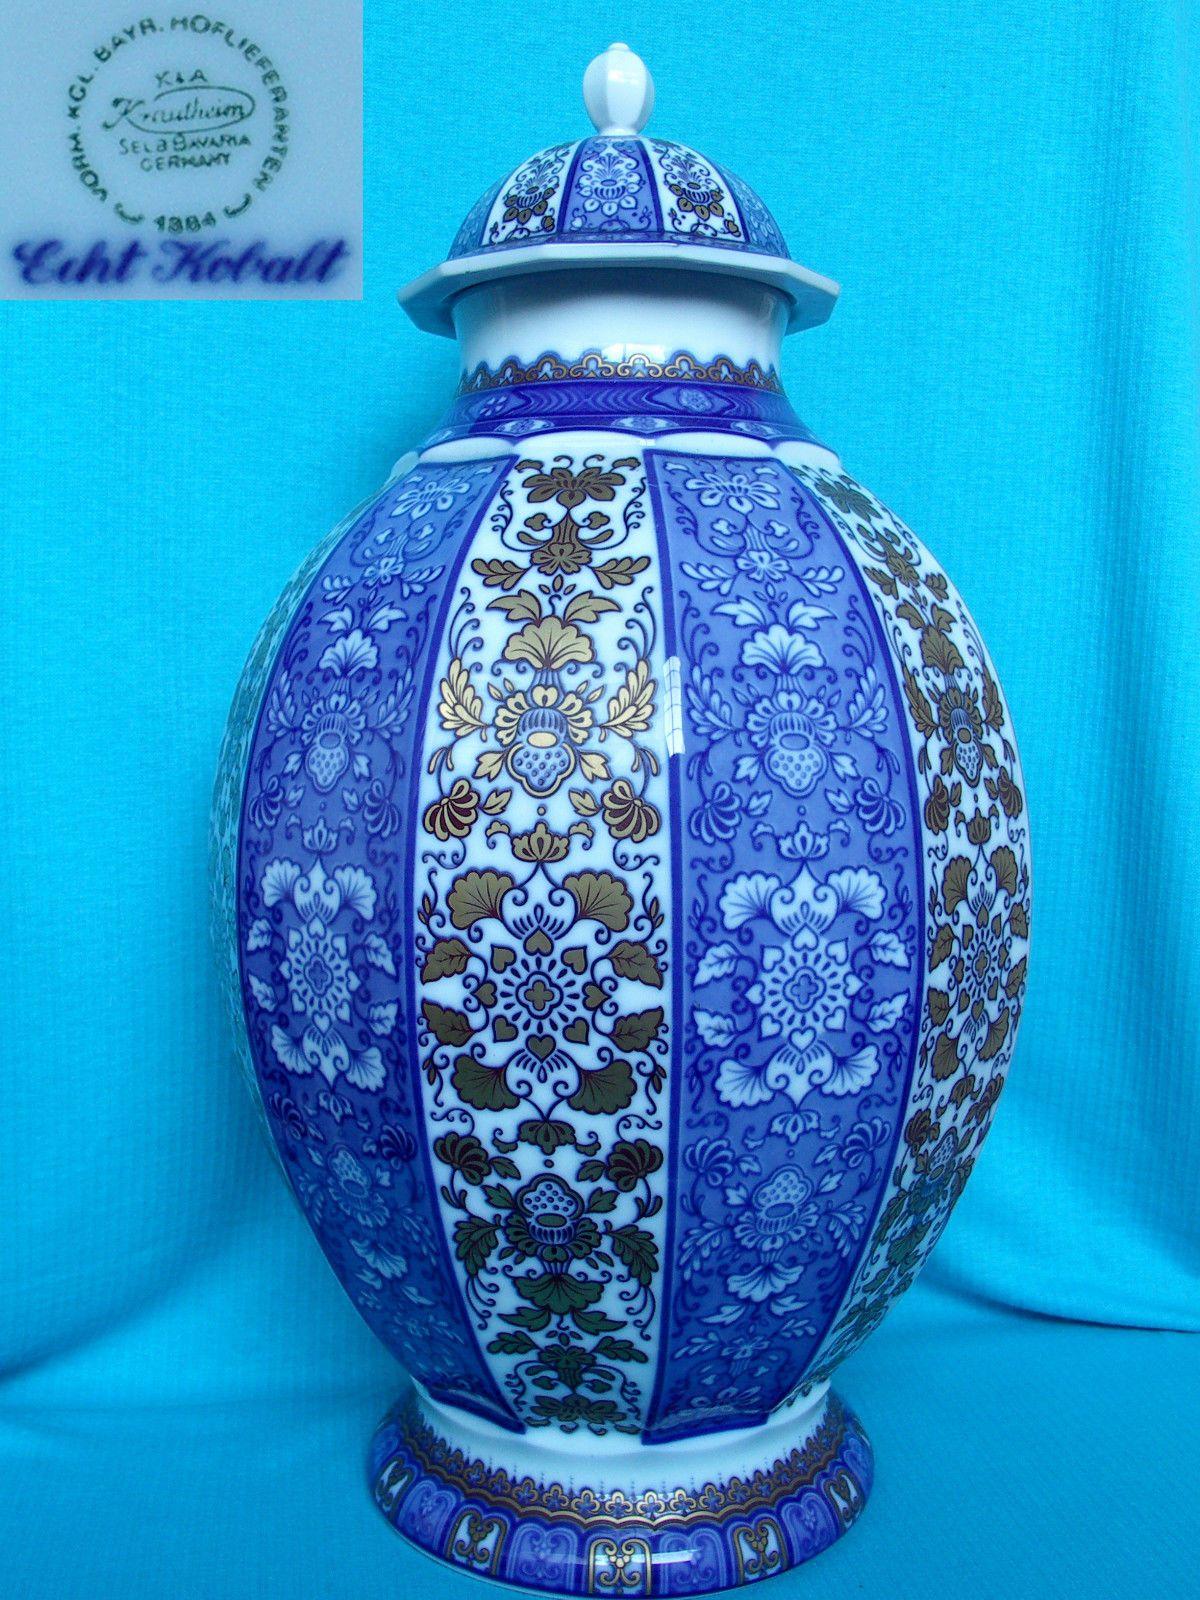 Great Vase 50cm splendor cover genuine cobalt K & A Krautheim Selb Bavaria porcelain